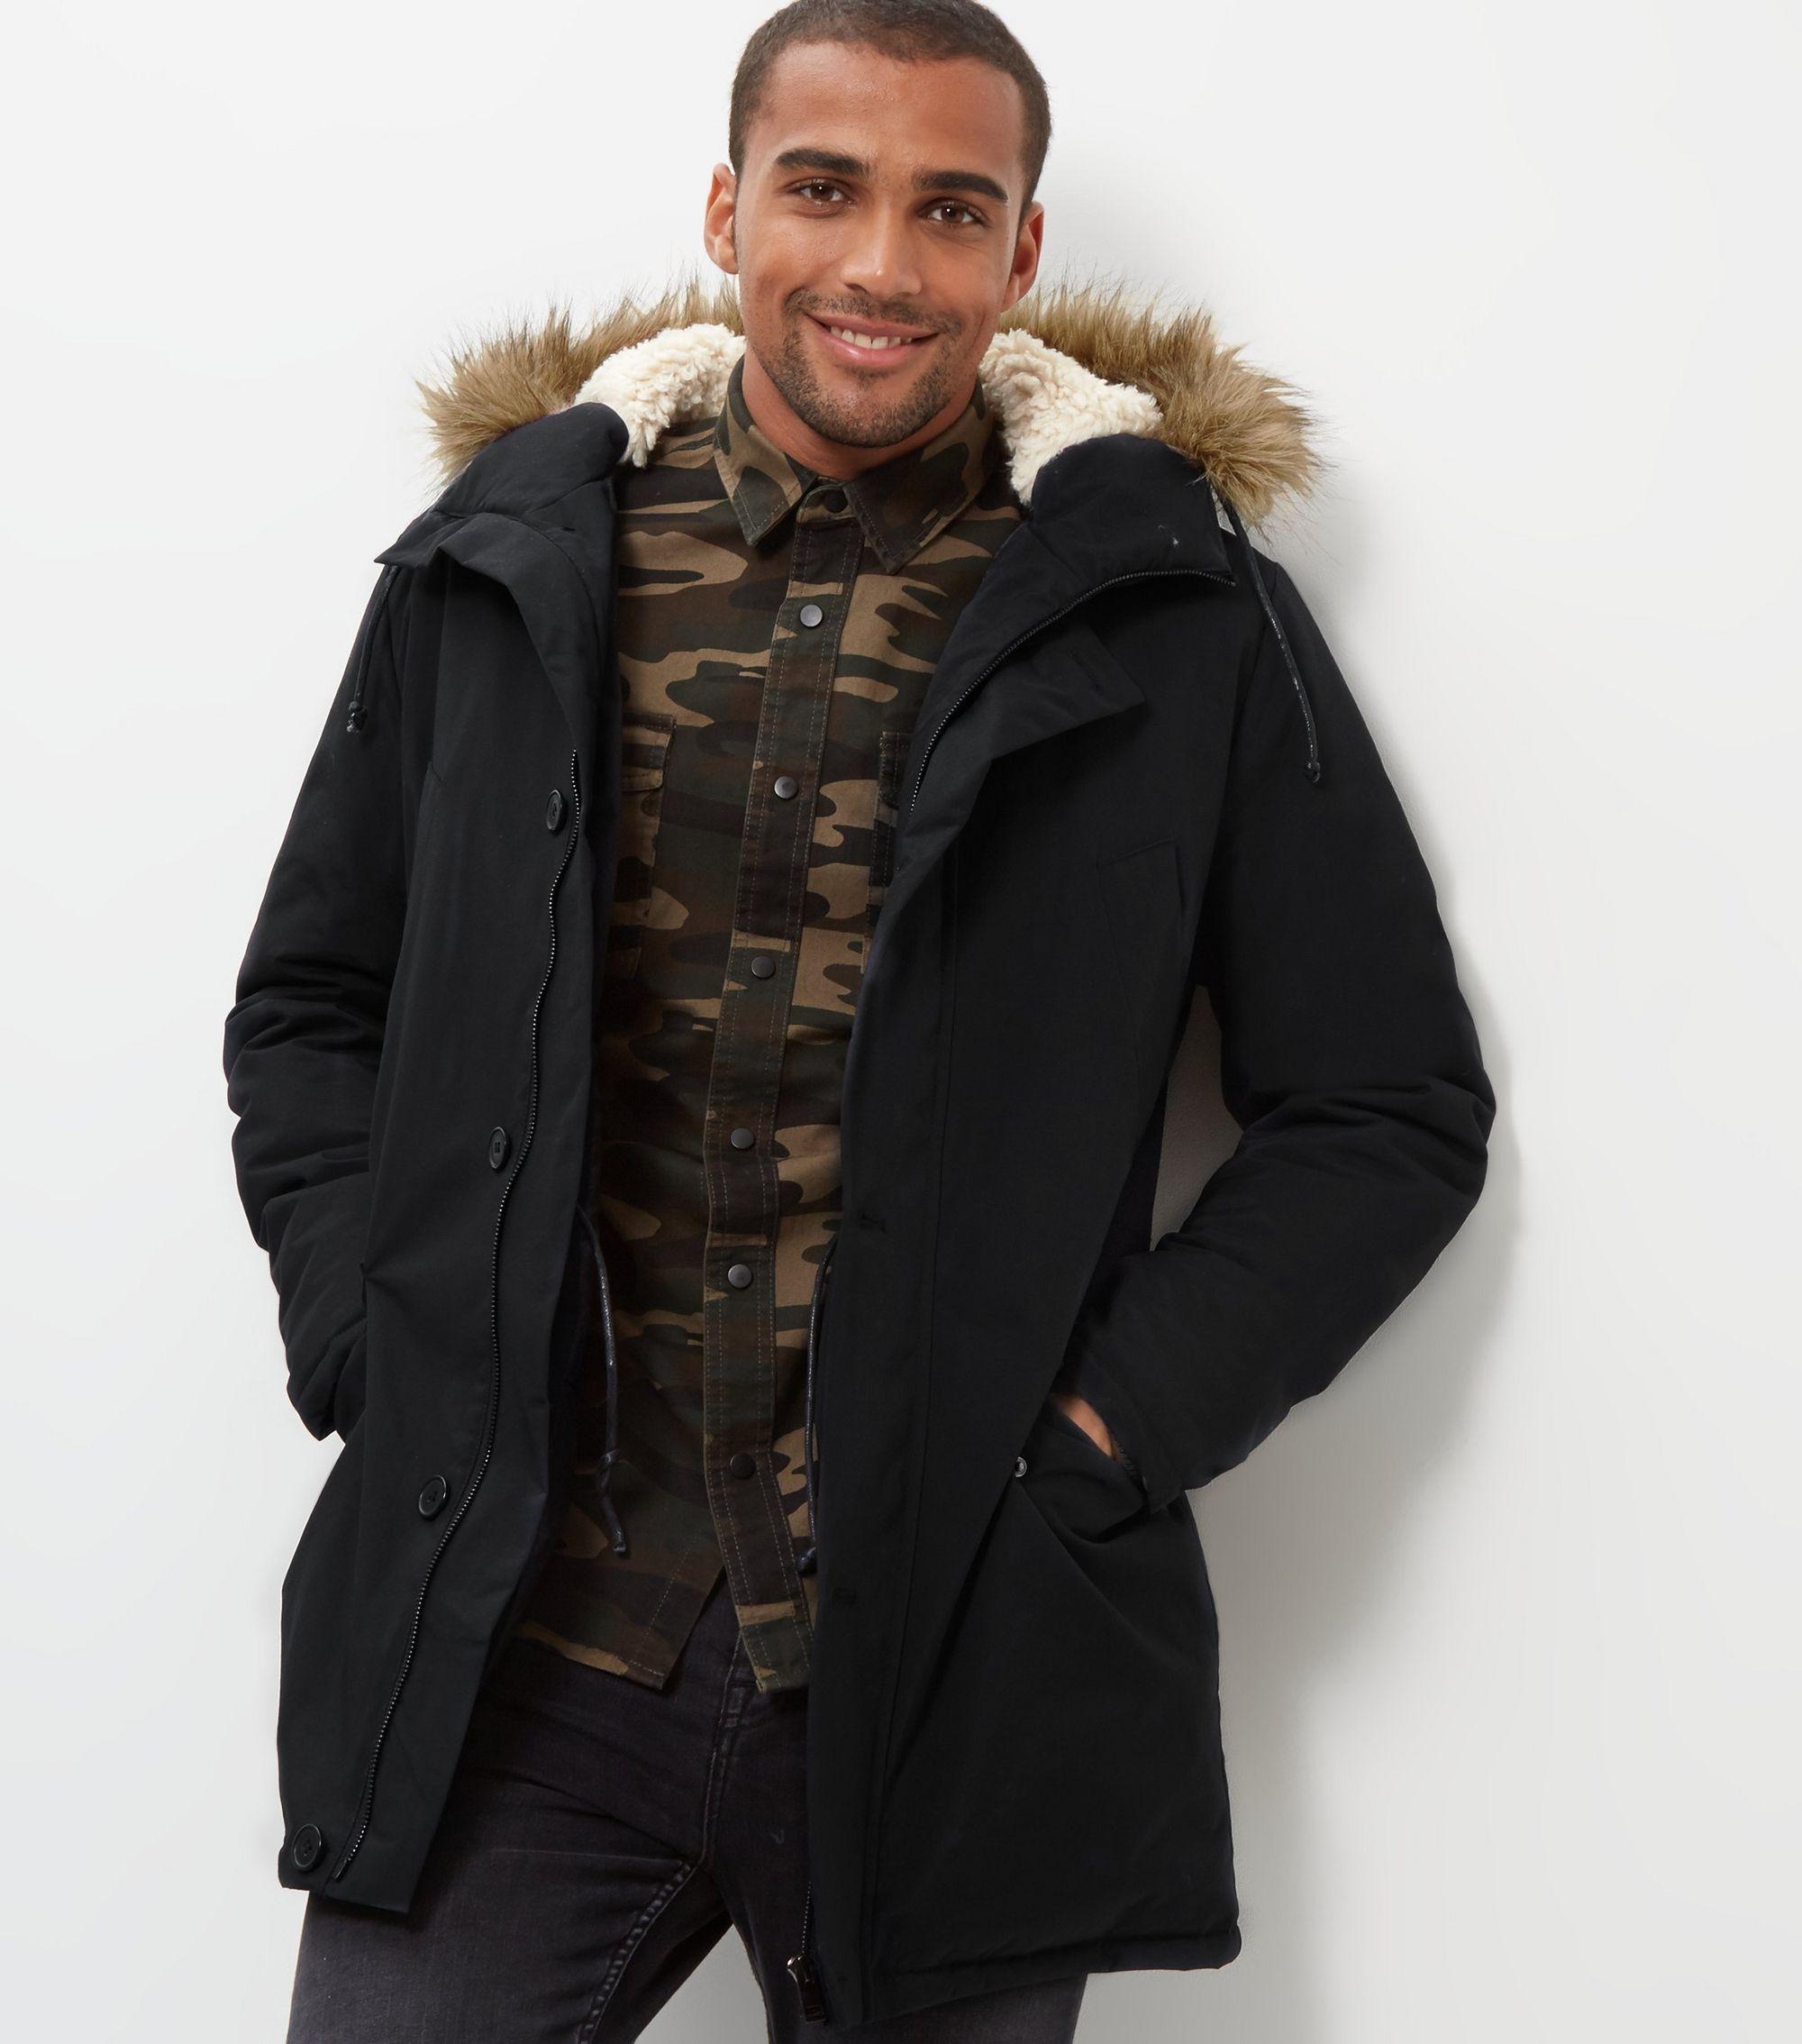 http://media.newlookassets.com/i/newlook/387762401/mens/jackets-and-coats/coats/black-faux-fur-trim-hooded-parka/?$new_pdp_szoom_image_2000$